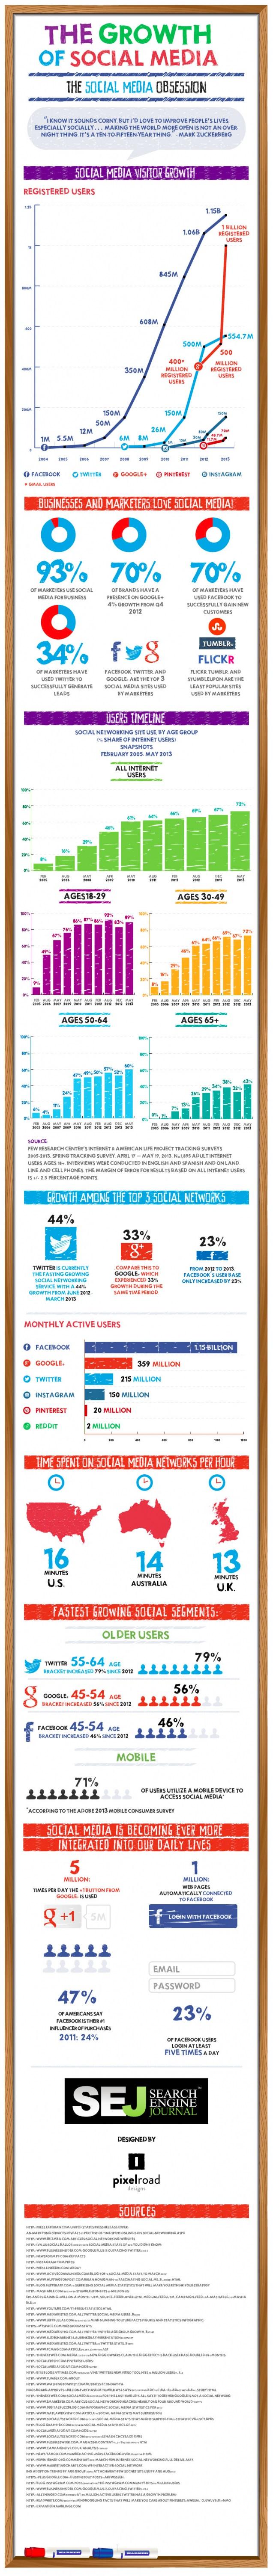 growth-of-social-media-2013-637x6021